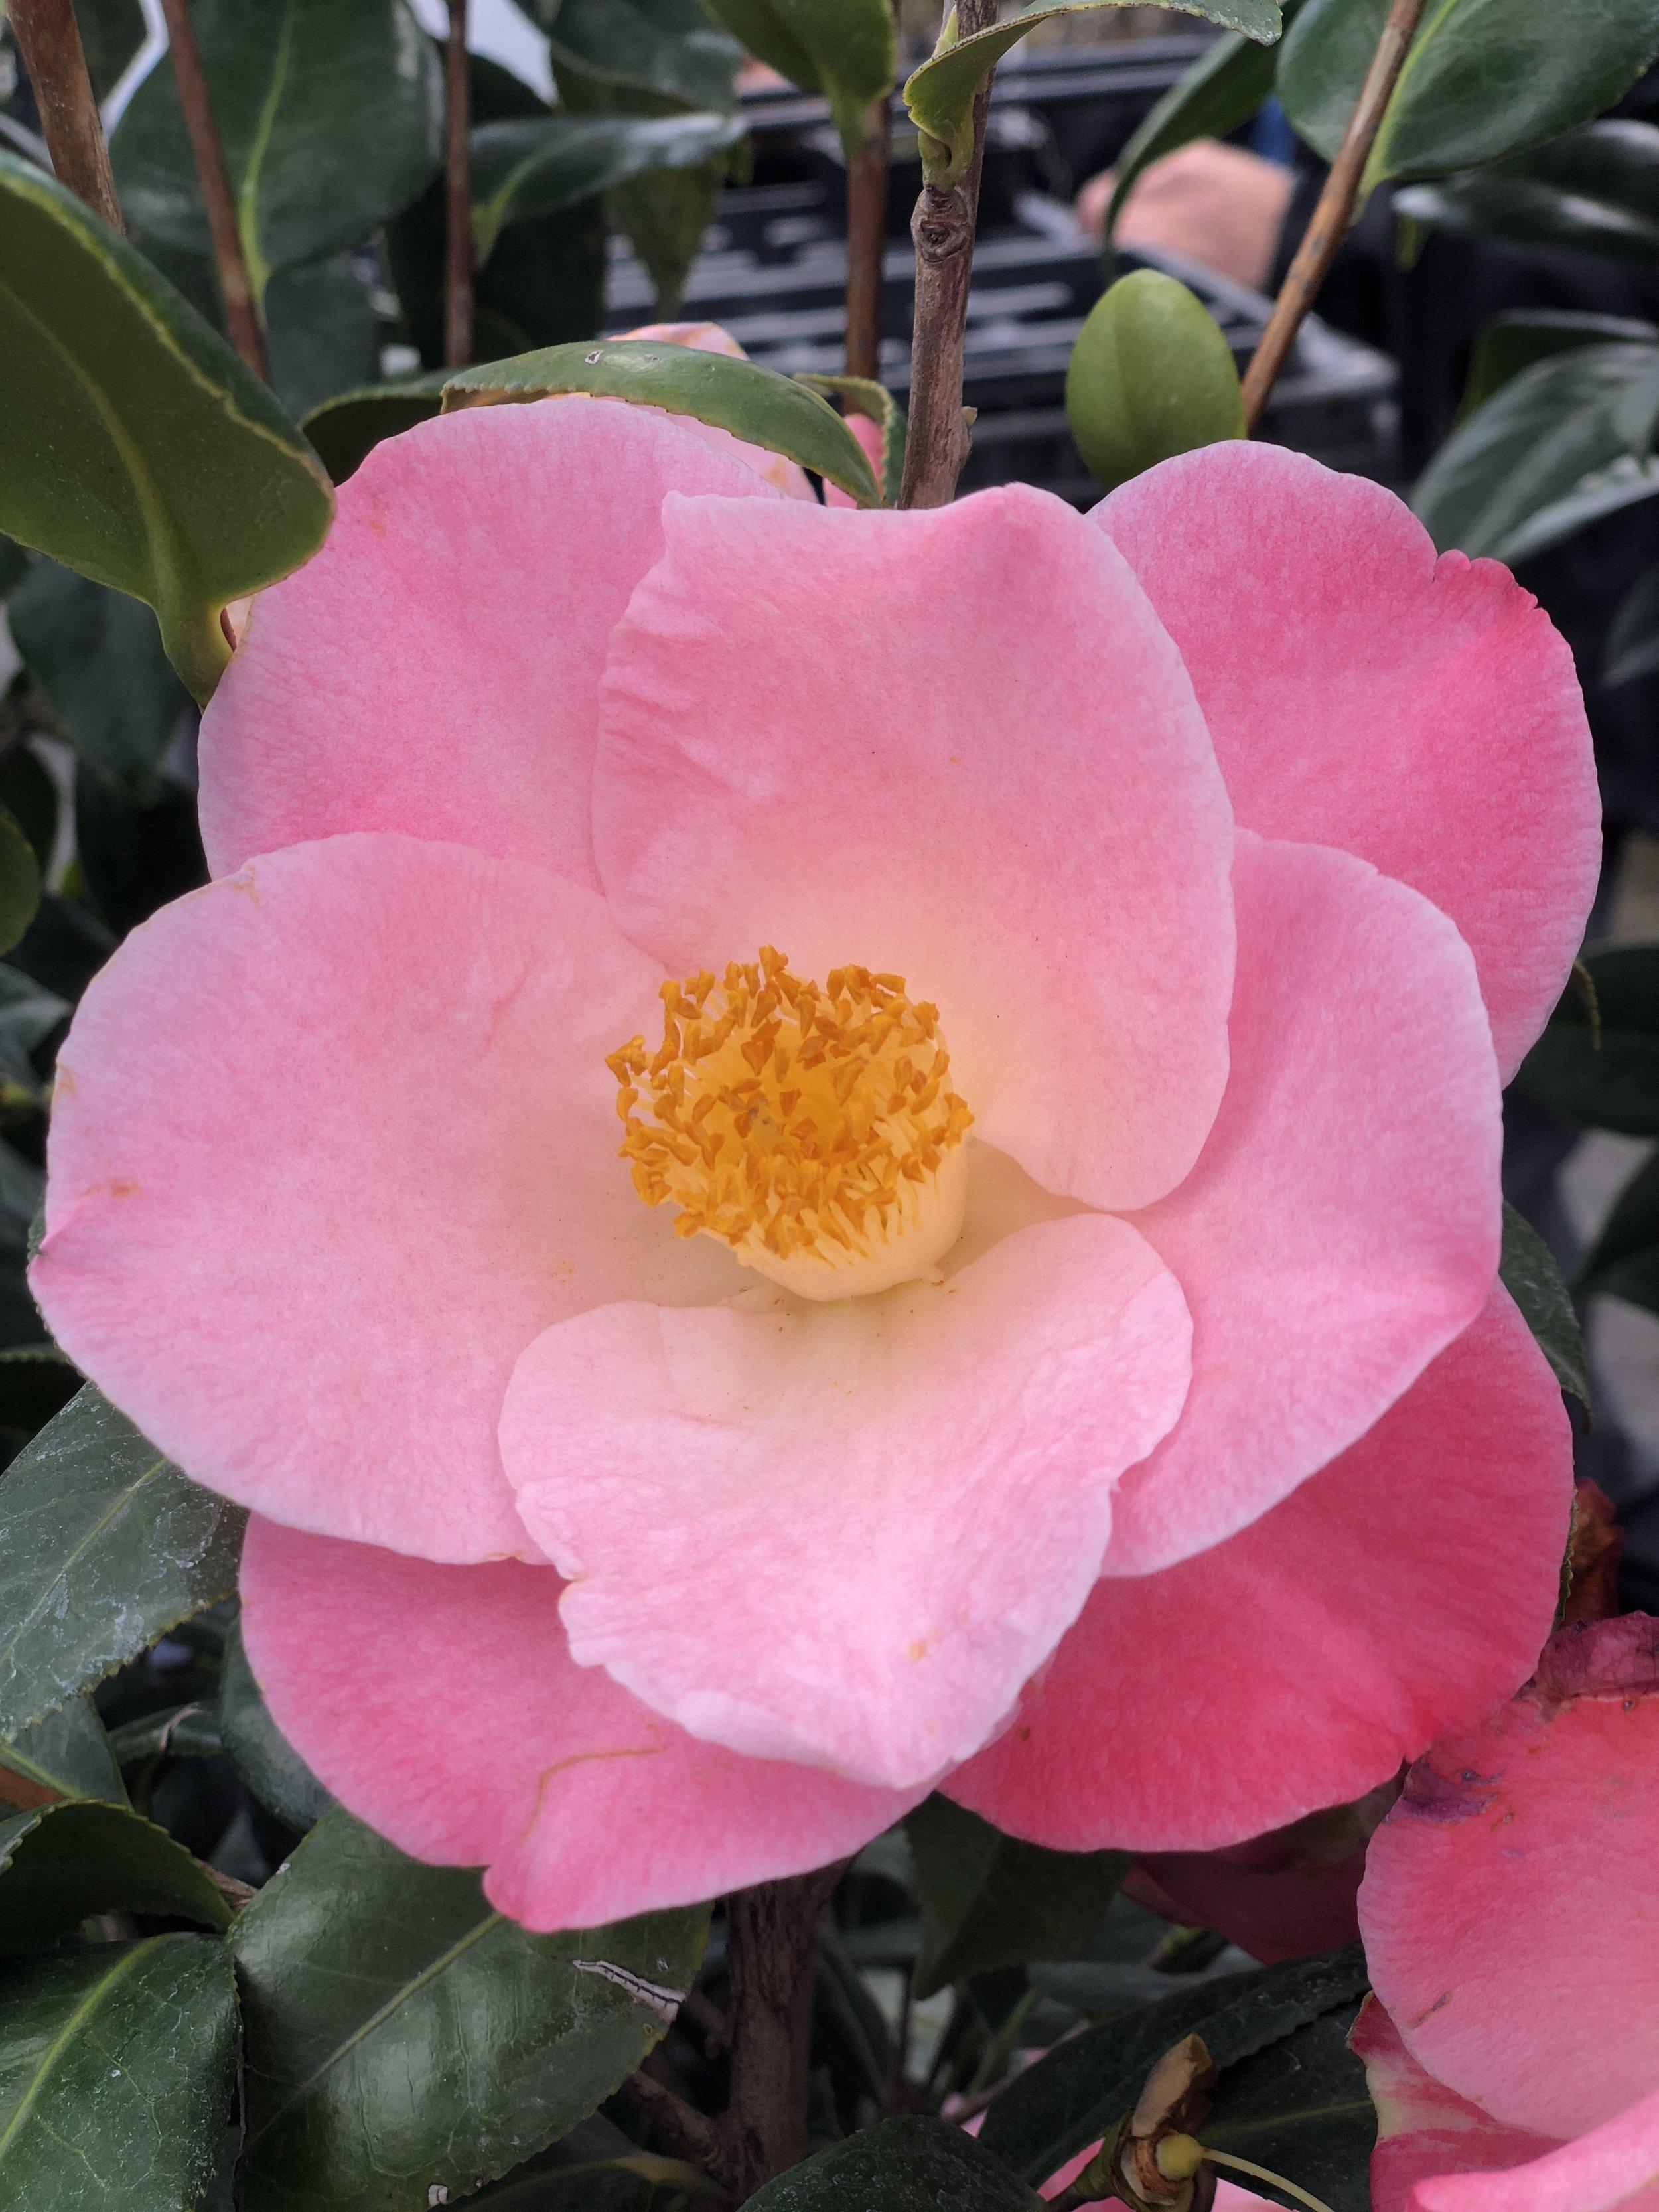 Camellia j. 'Nuccio's carousel'